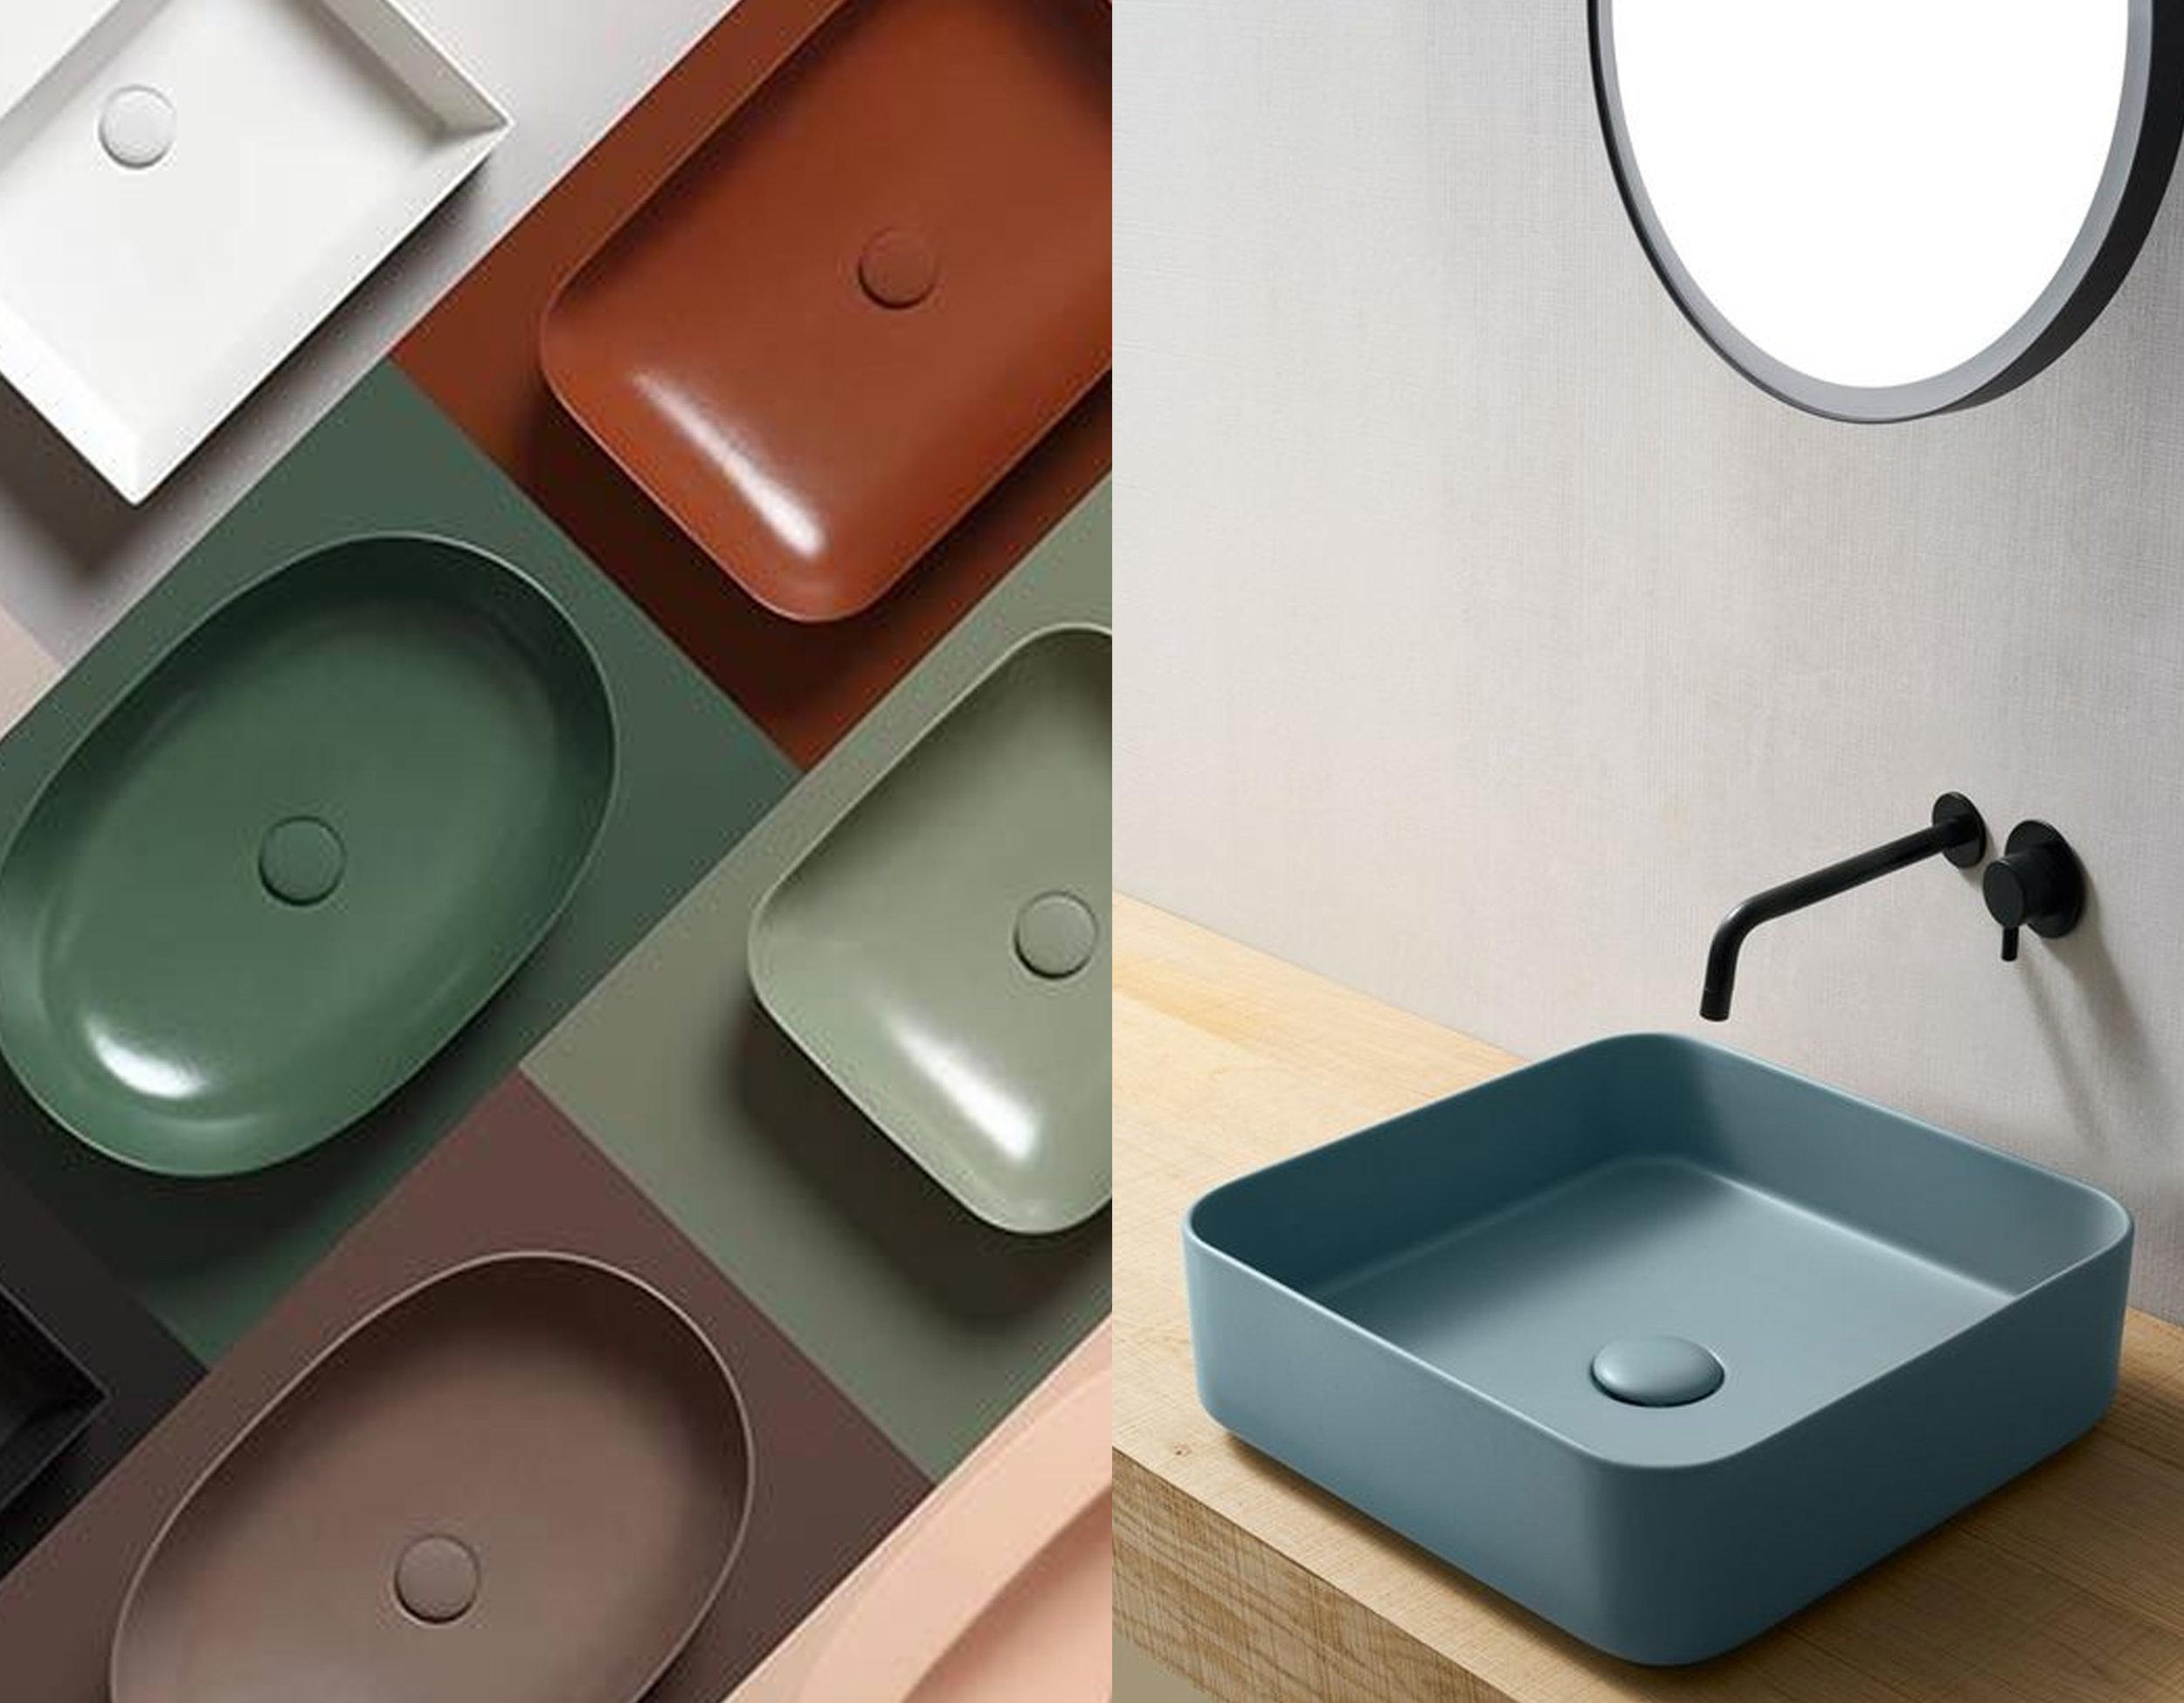 washbasin and shelve in same color Colors 125  Azzurra Ceramica  - washbasin Shui  Comfort Cielo